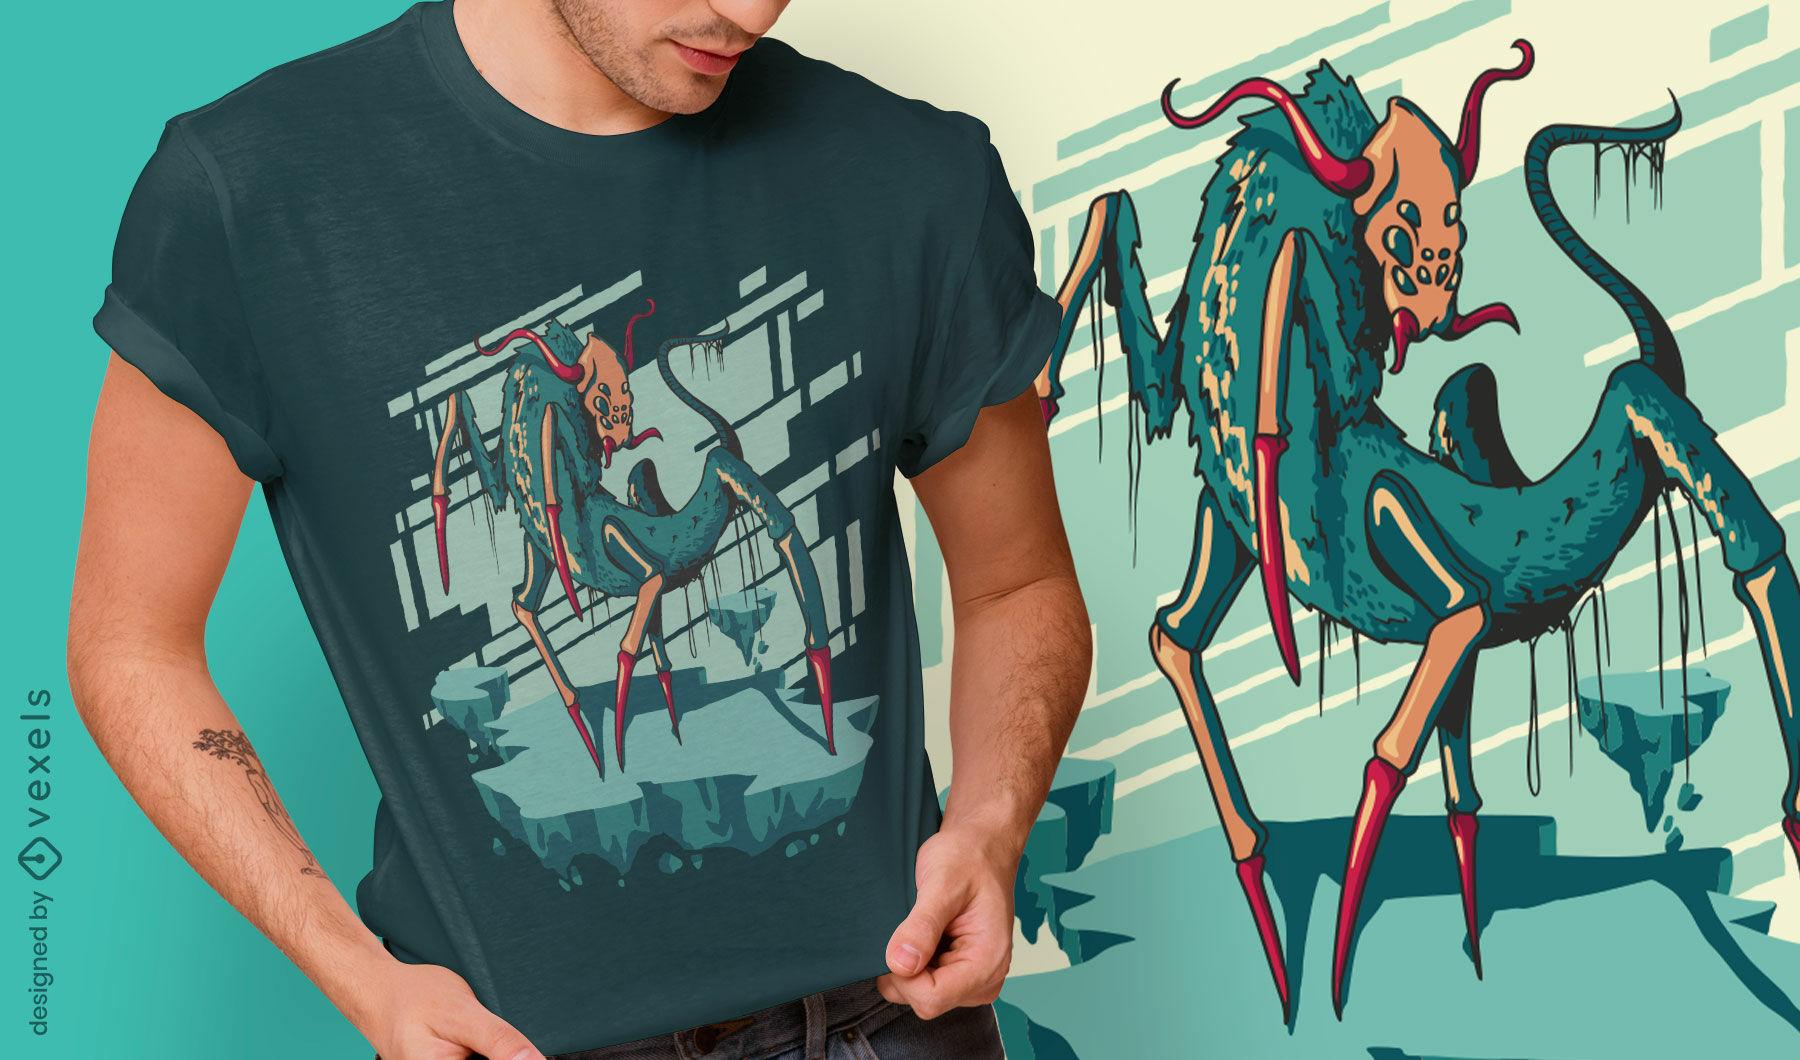 Insekten-Albtraum-Monster-T-Shirt-Design